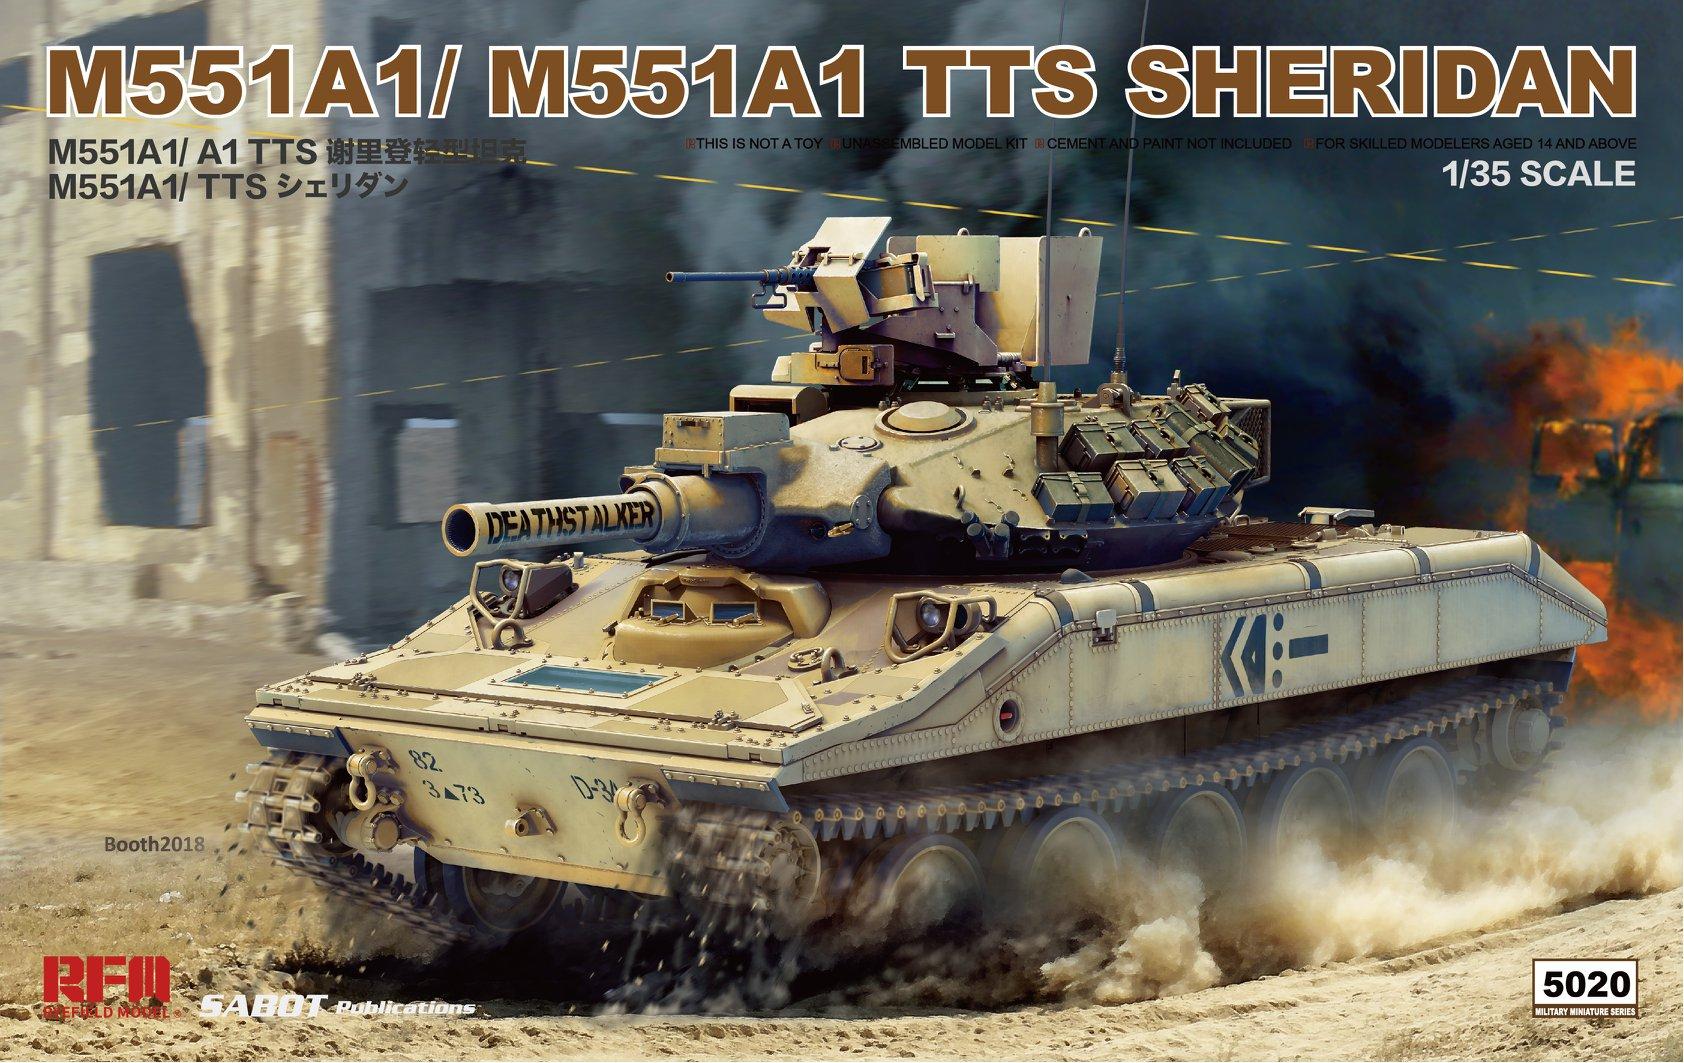 RM-5020 M551A1/ A1(TTS) SHERIDAN